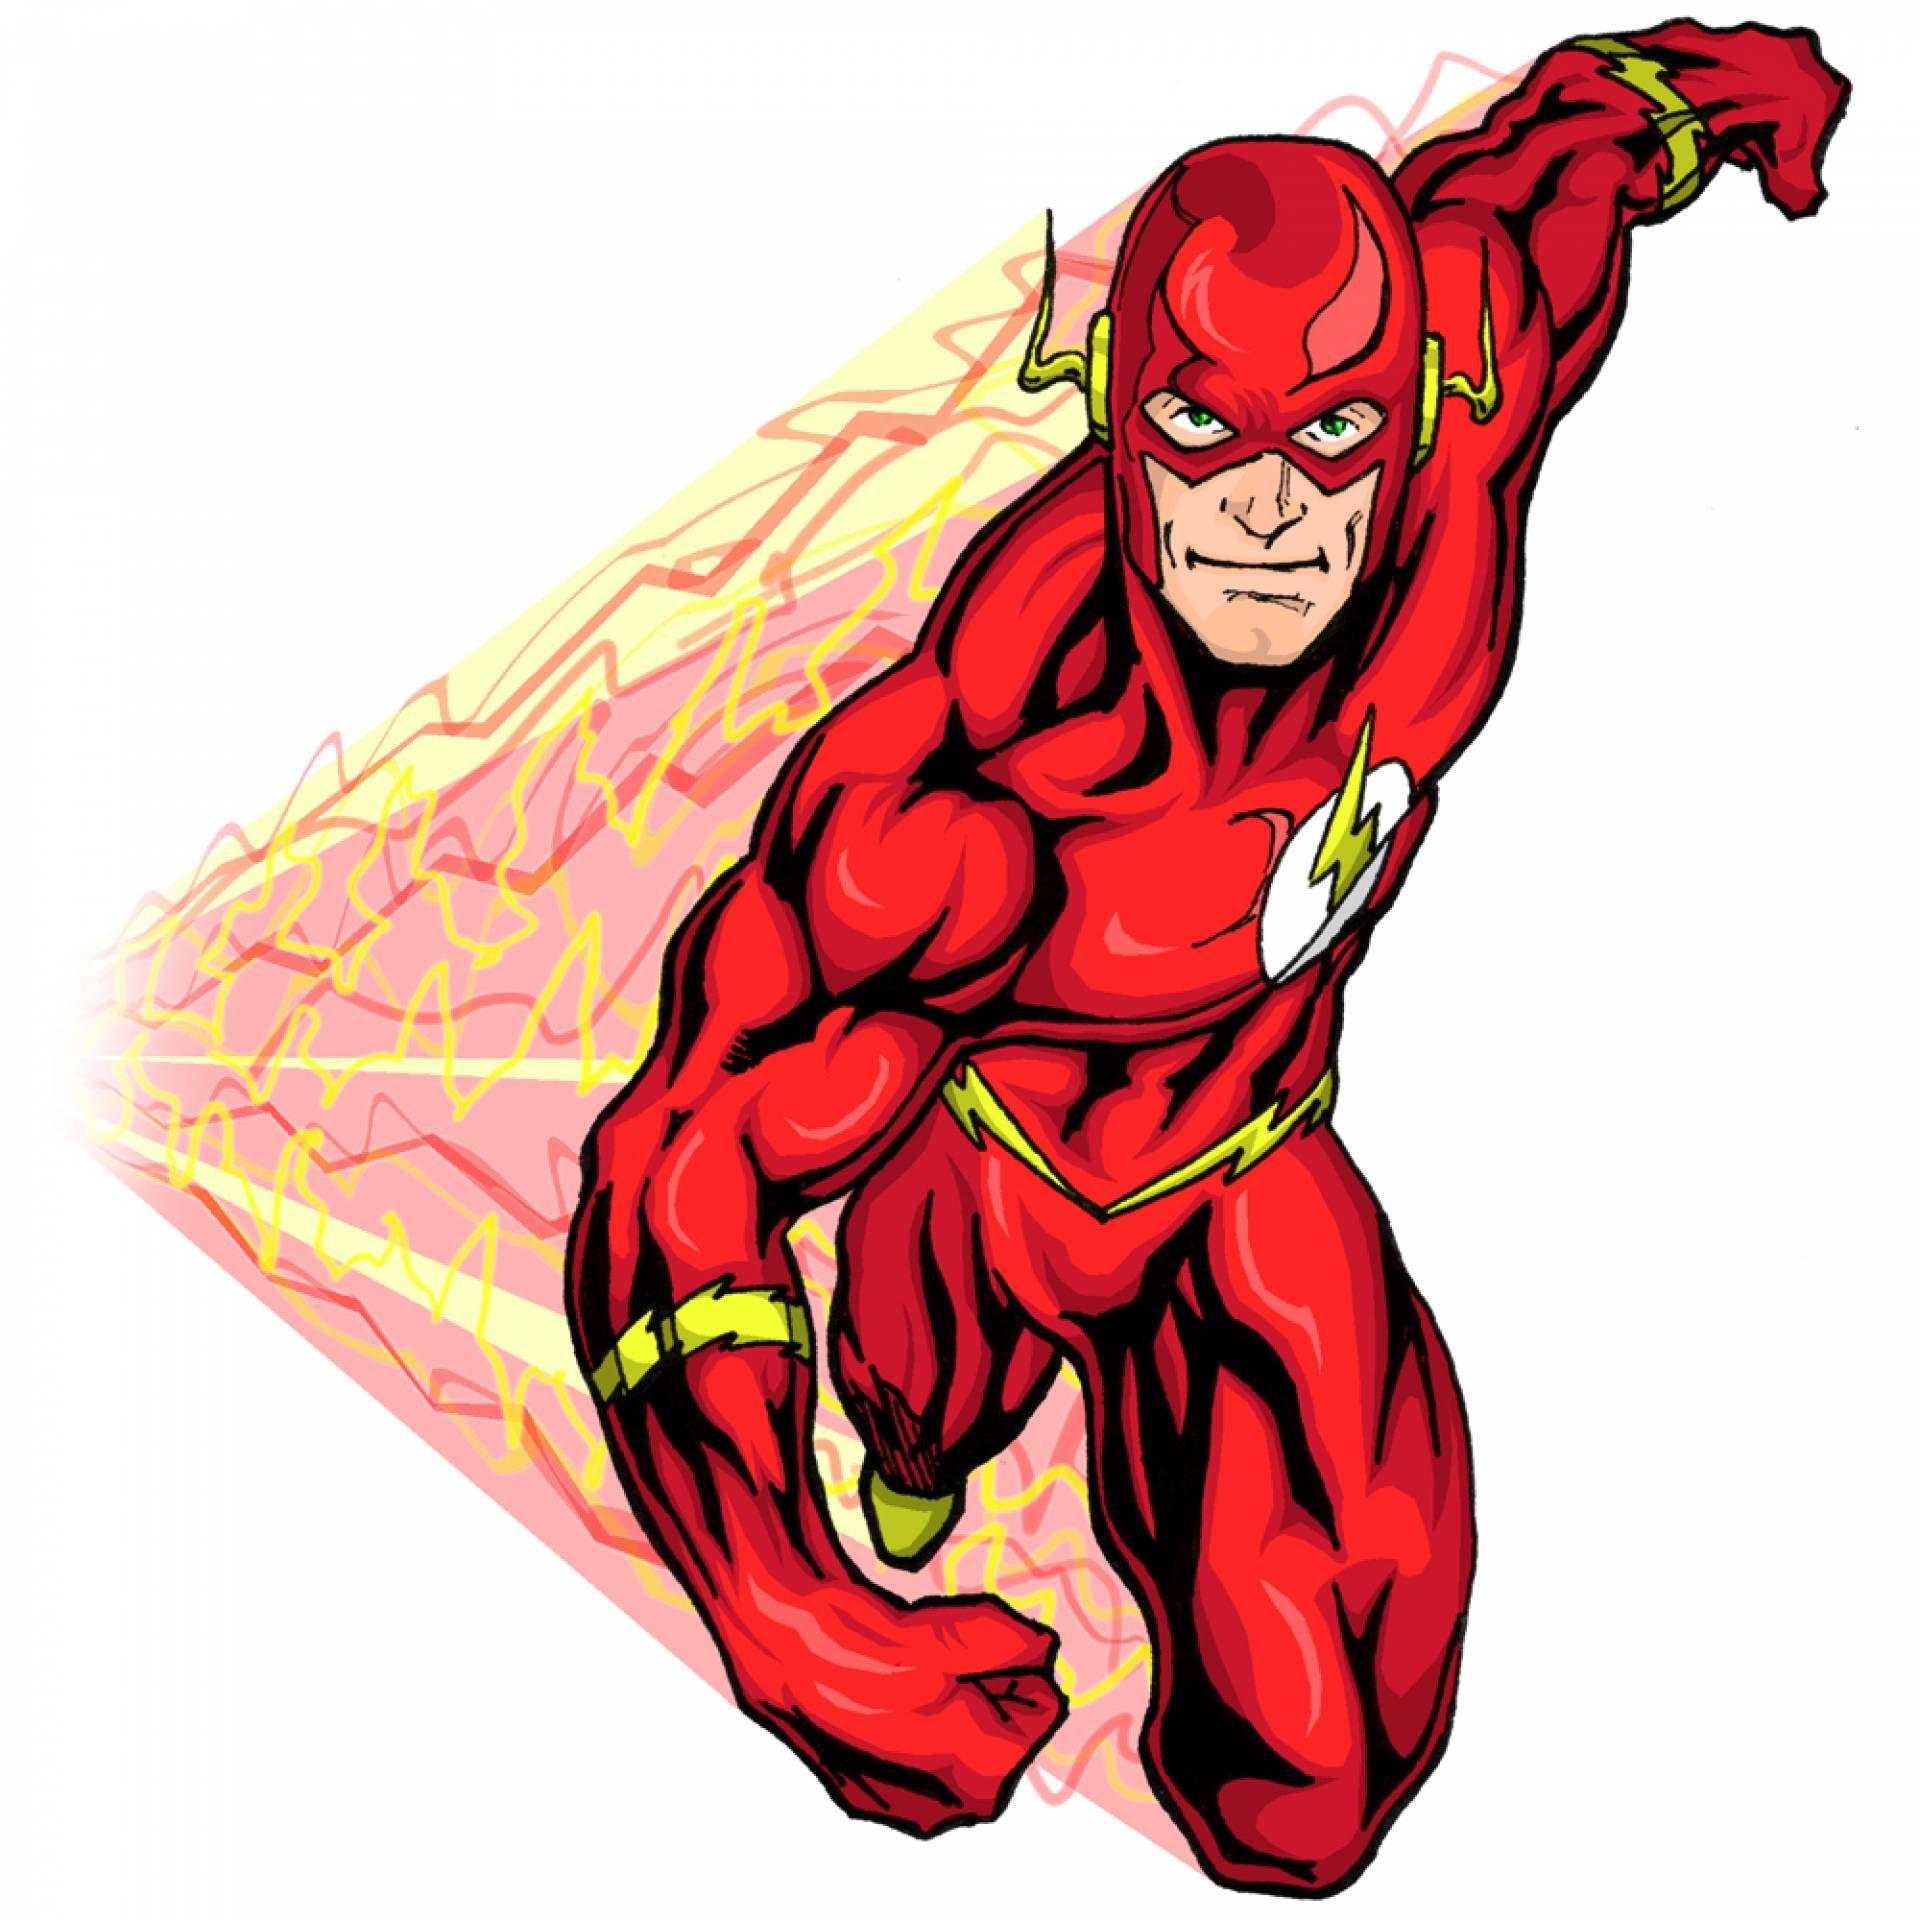 Speed Throwing Superpower Wiki Fandom Powered By Wikia Superhero Printables Superhero Printables Free Superhero Party